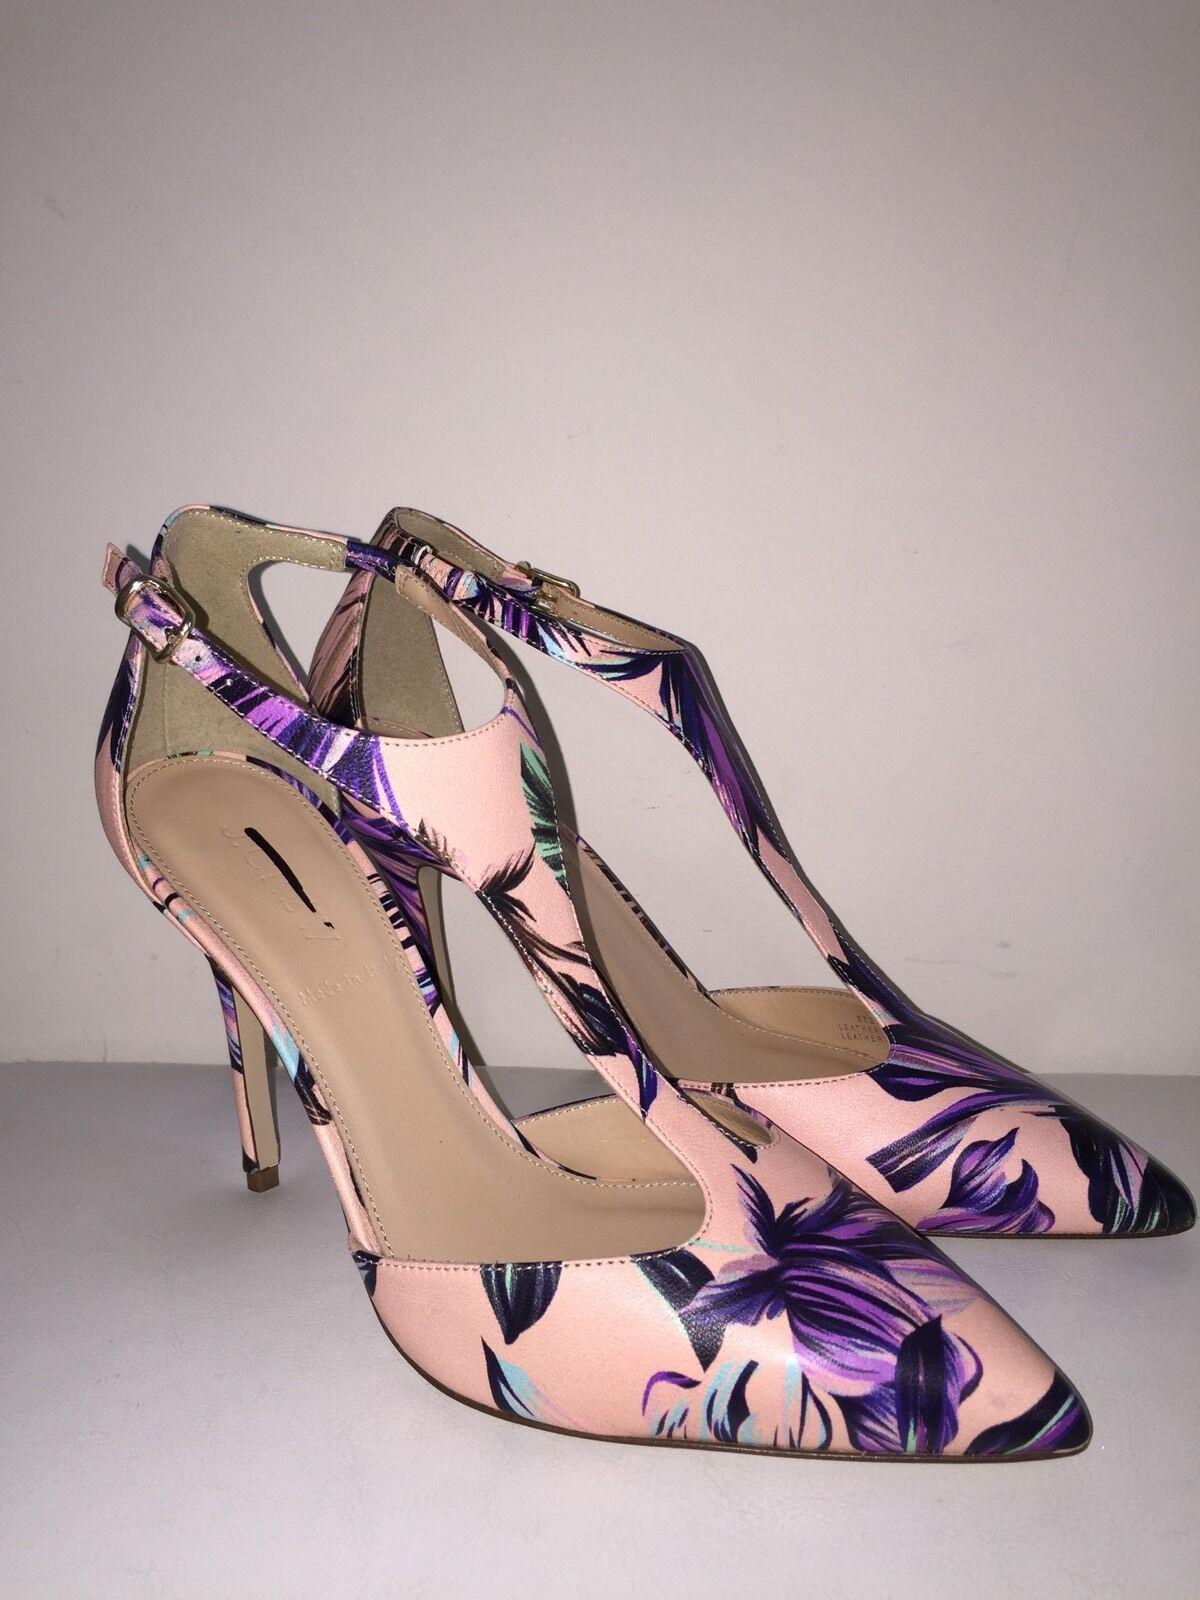 J Crew Damenschuhe Roxie T-strap pumps in romantic floral print Heels Schuhes 7 E7260